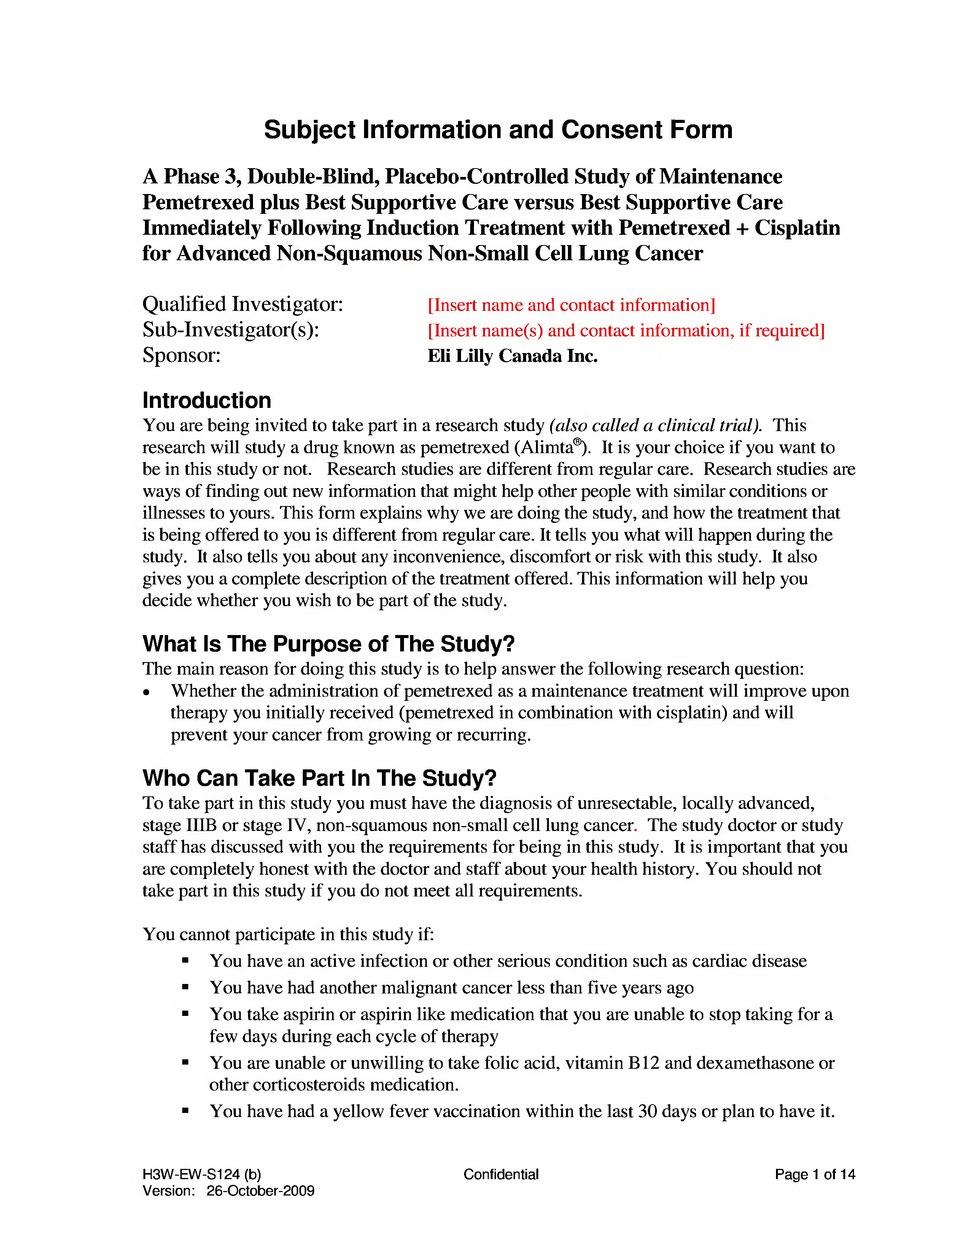 PARAMOUNT Eli Lilly Informed Consent Document.djvu